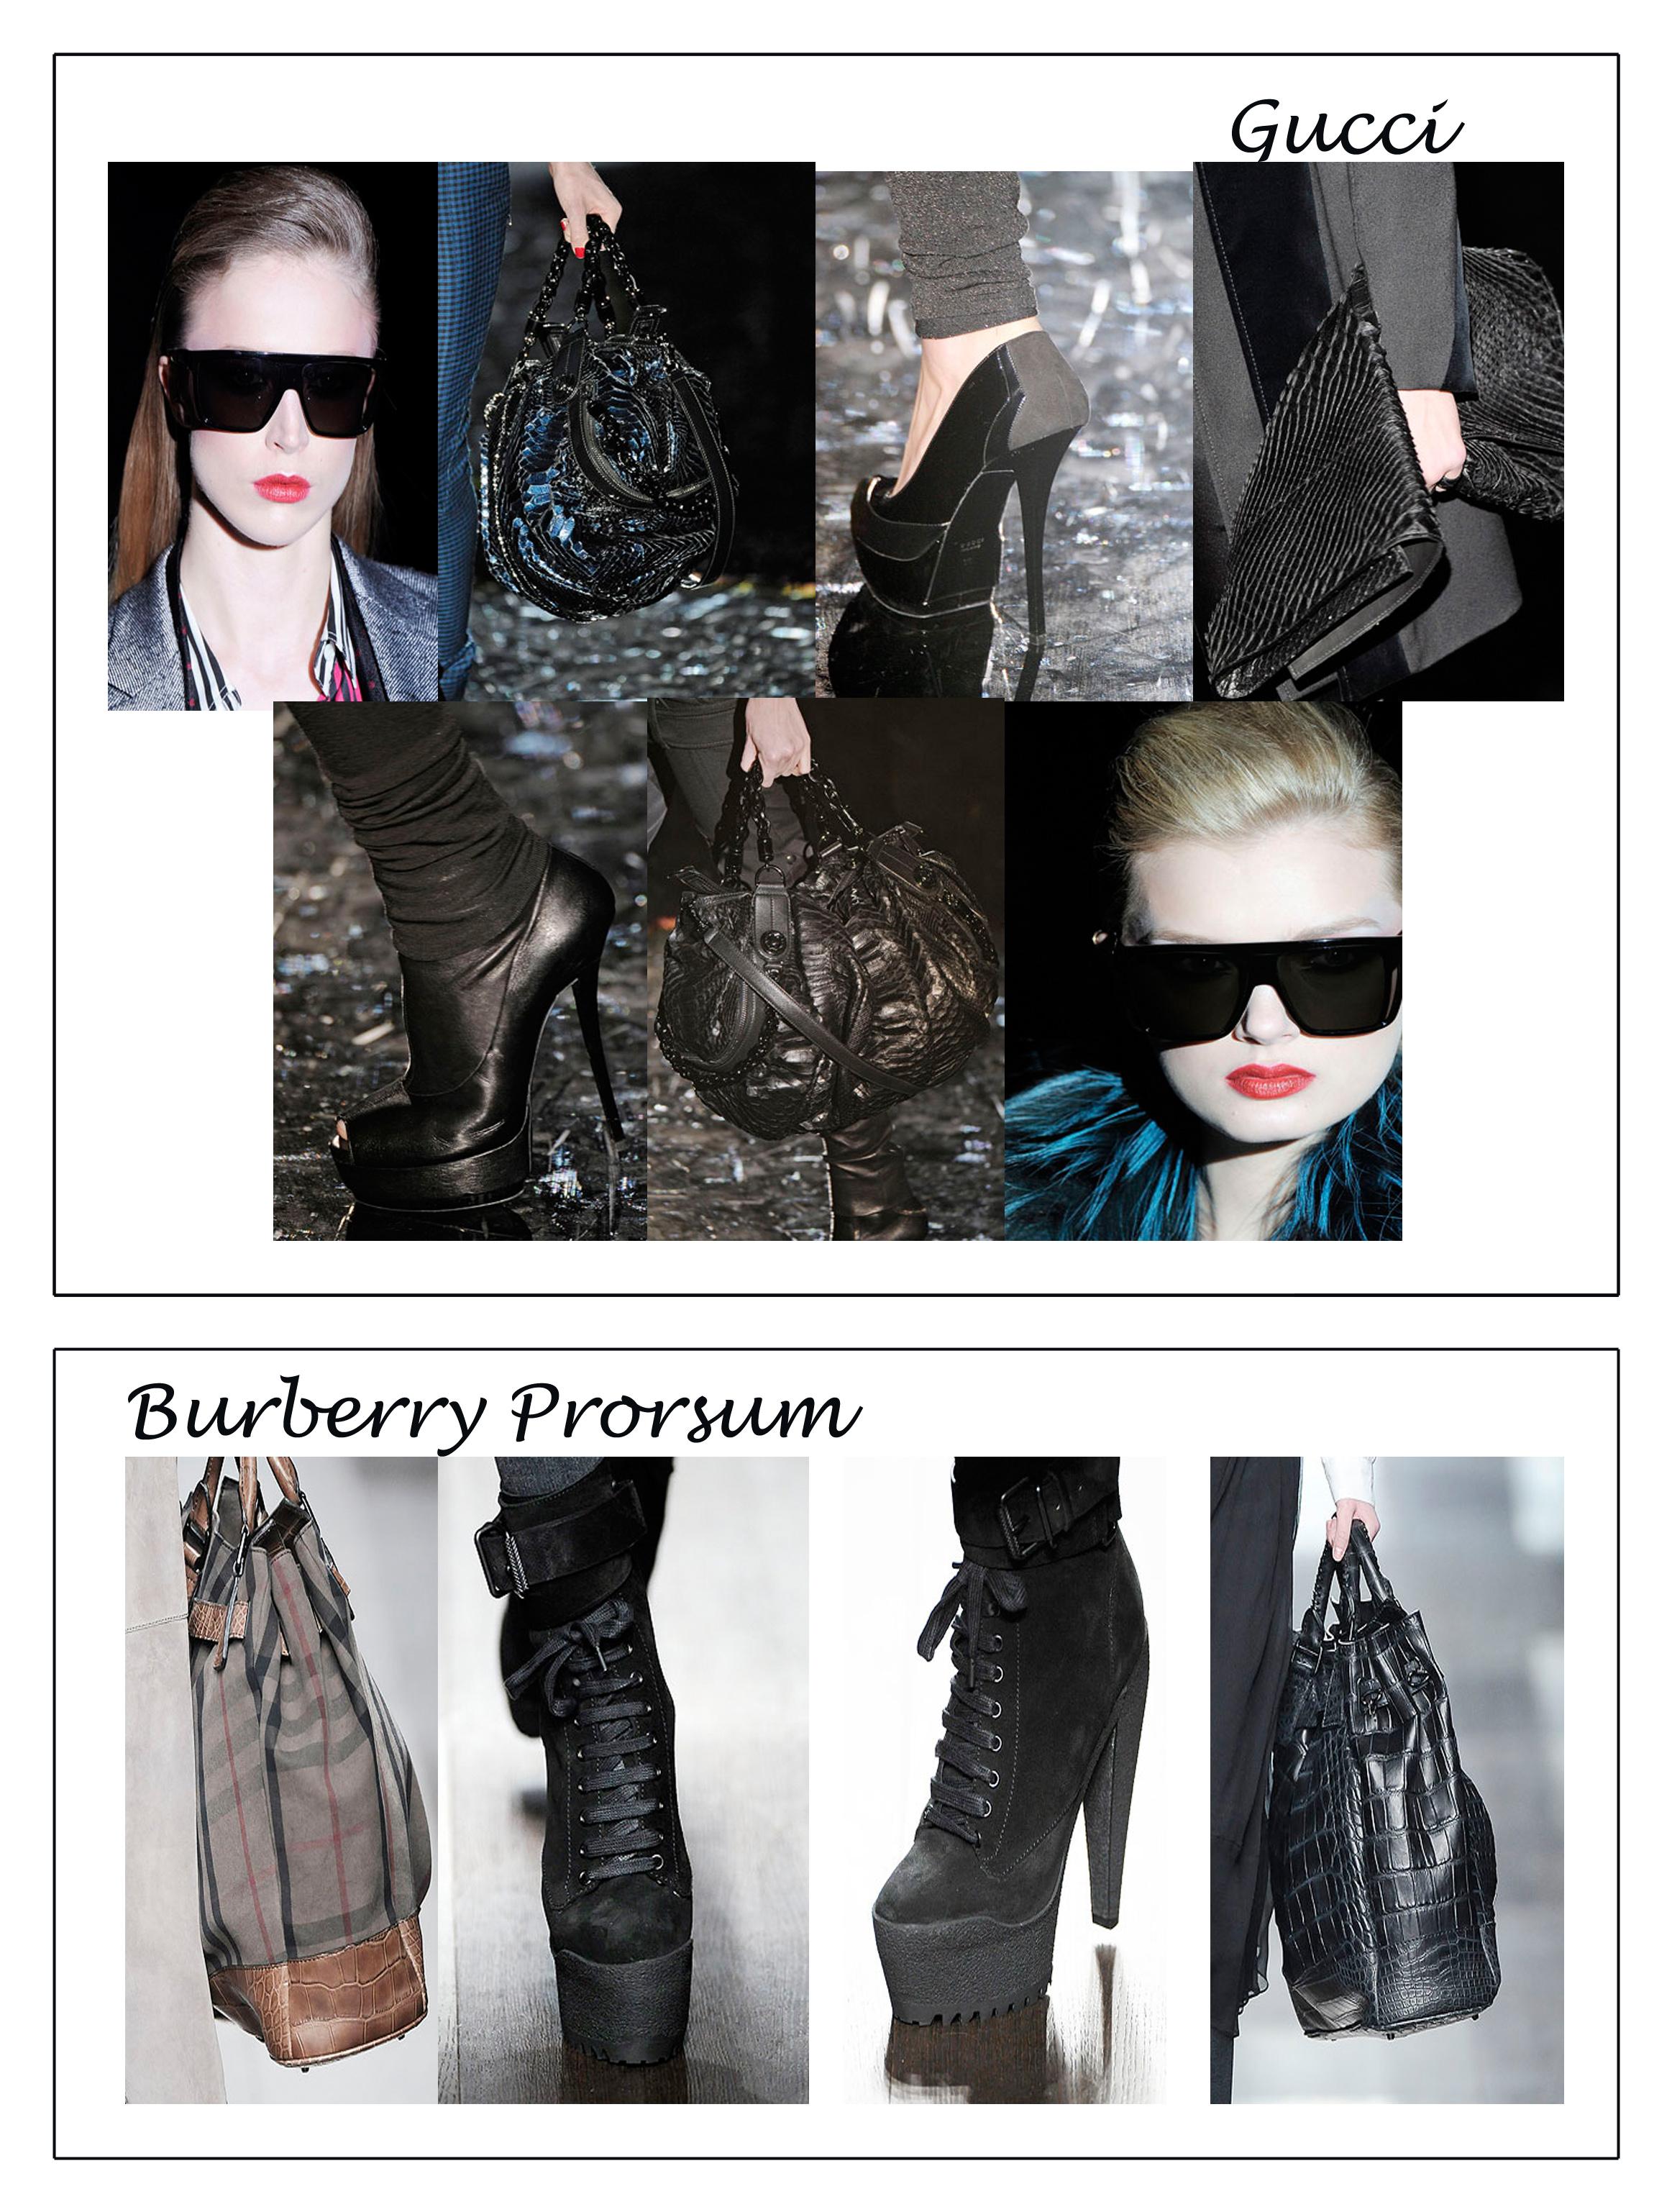 milan accessories 2